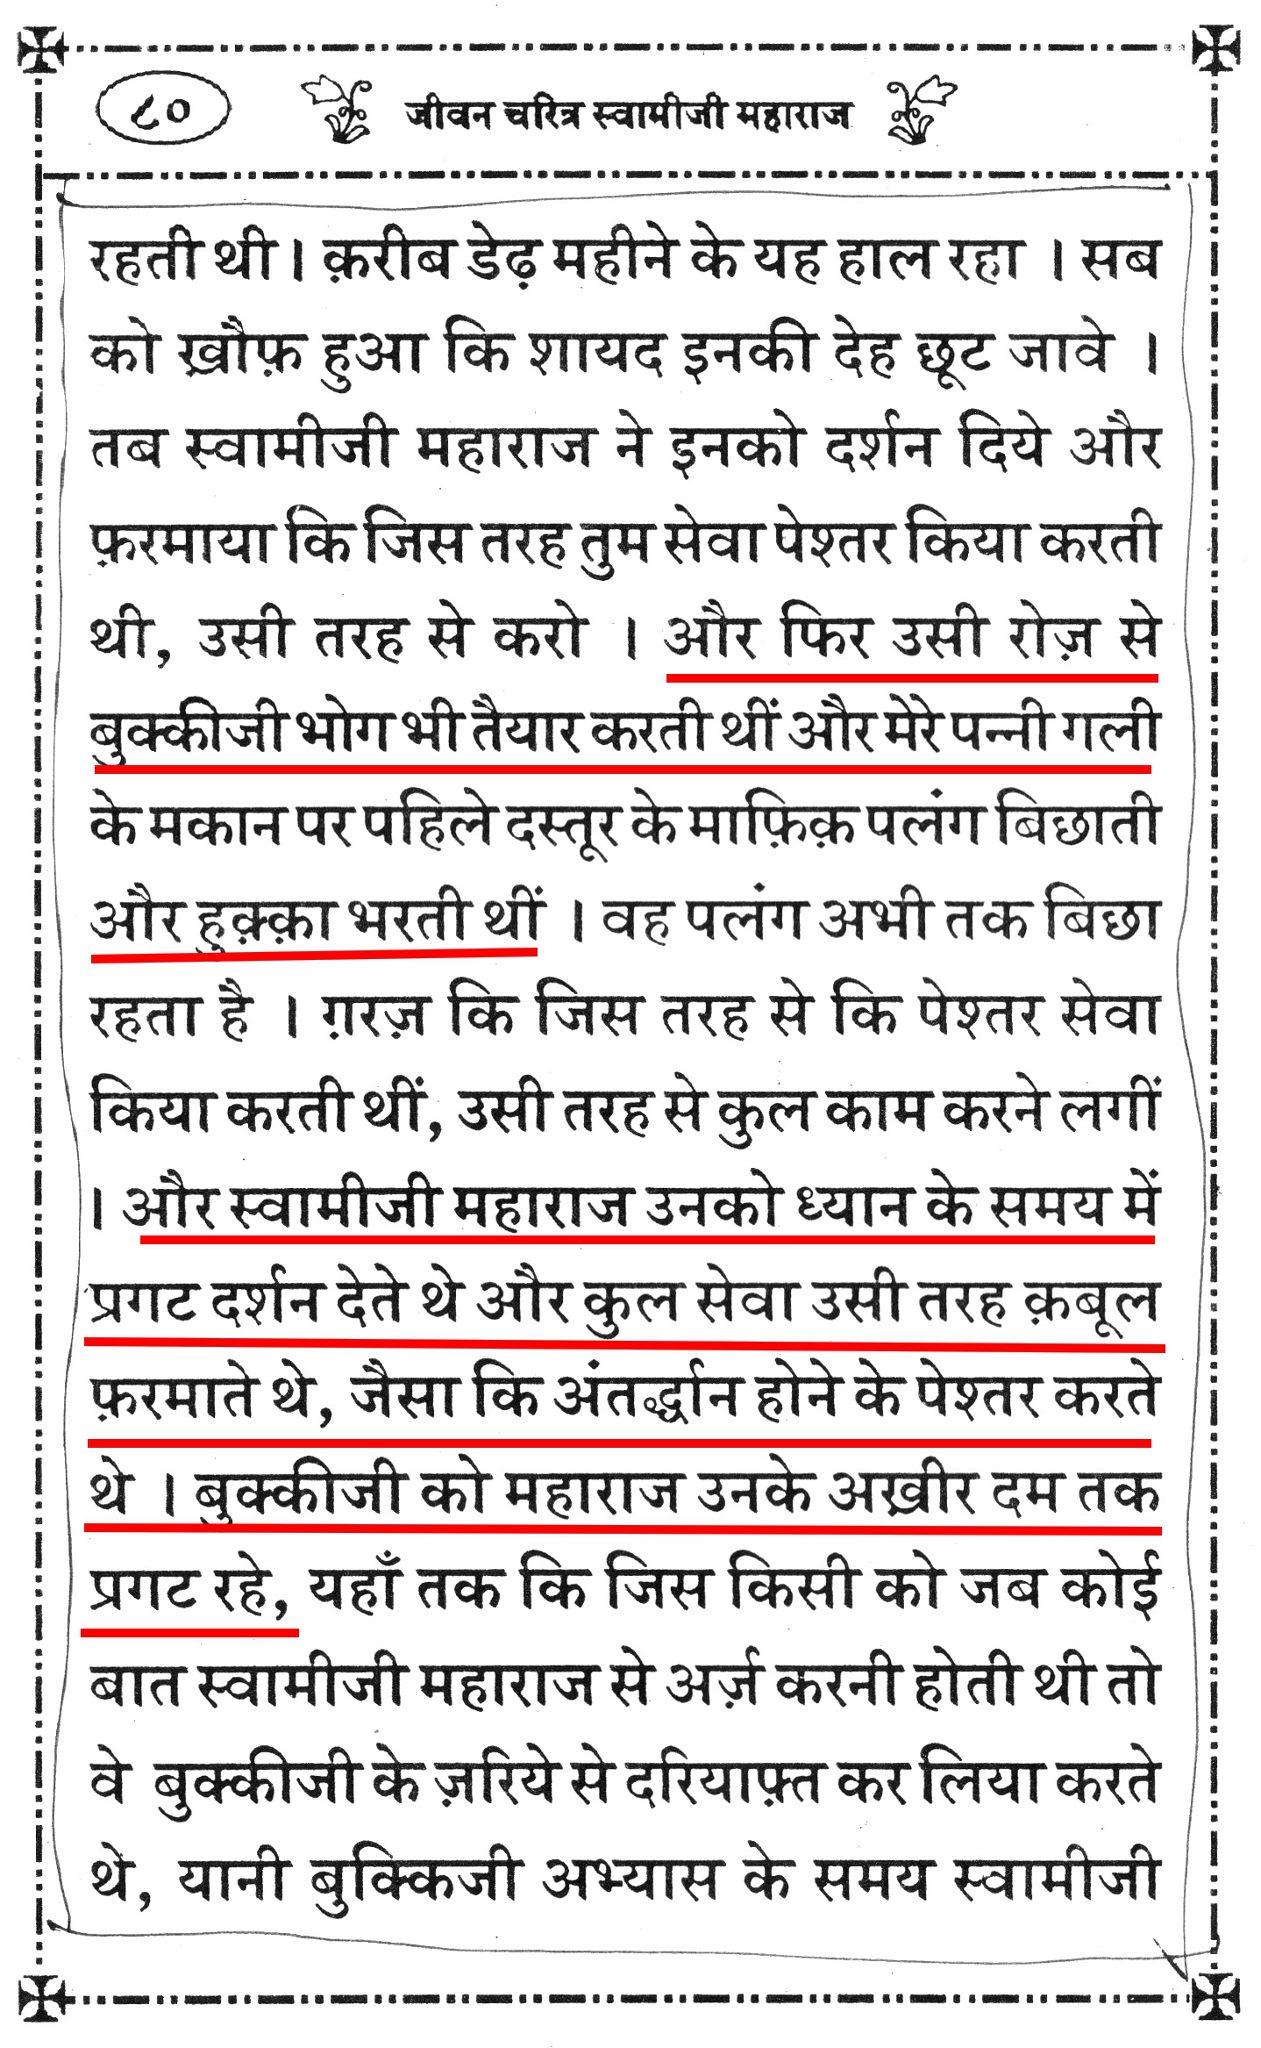 jeevan charitr swami ji maharaj